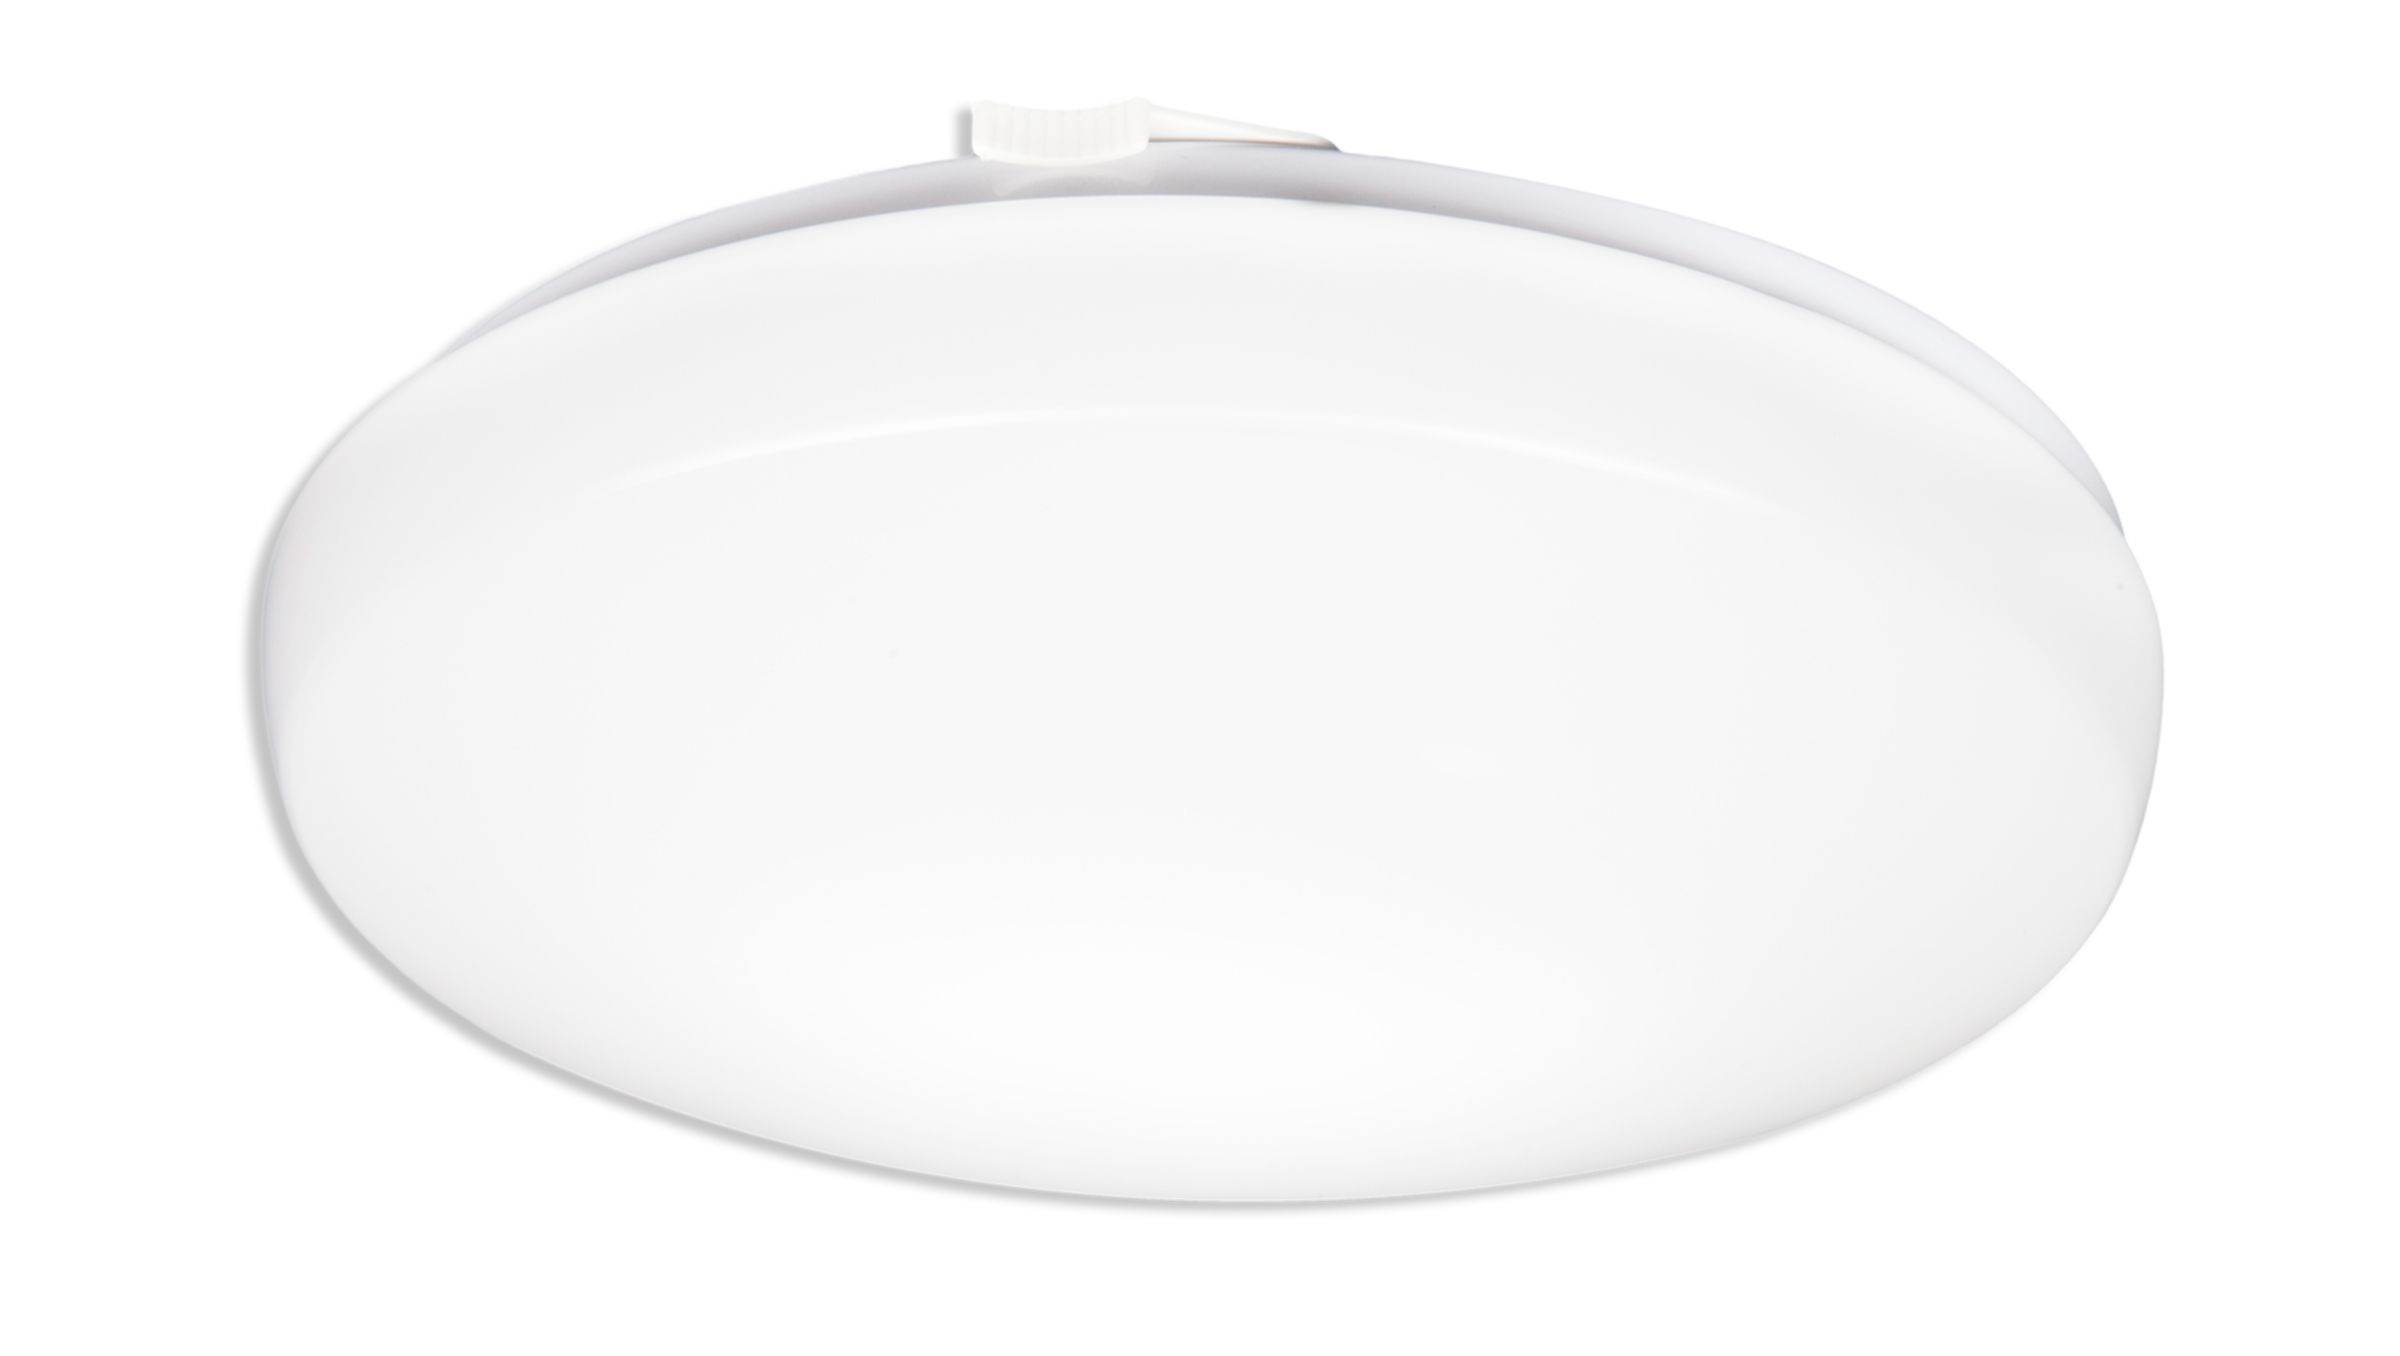 Lithonia Led Bathroom Lighting lithonia lighting fmlrl 11 14840 m4 ceiling light - build